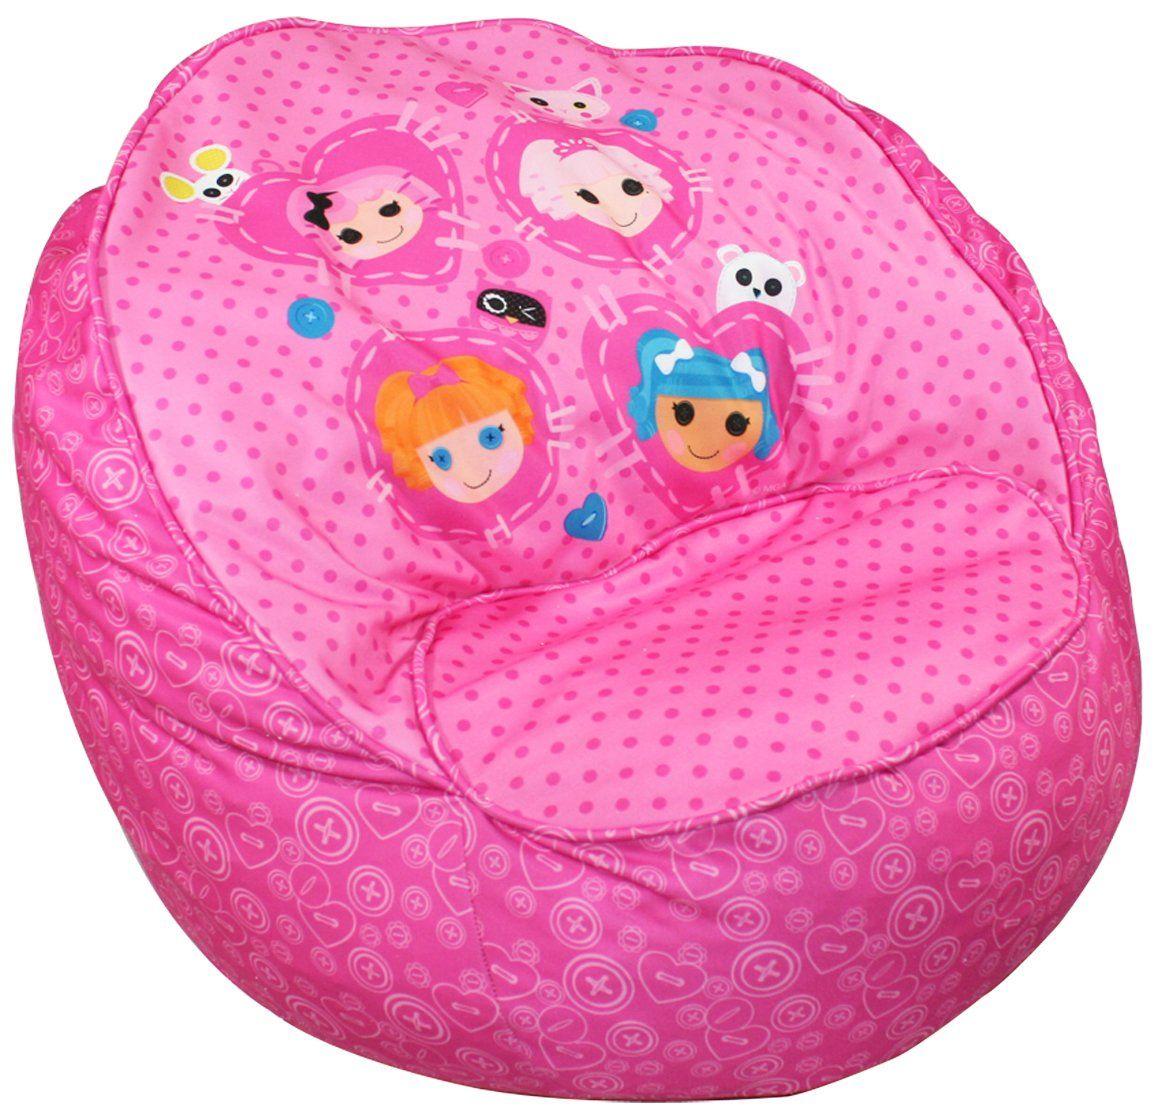 Lalaloopsy Bean bag chair kids, Toddler bean bag chair